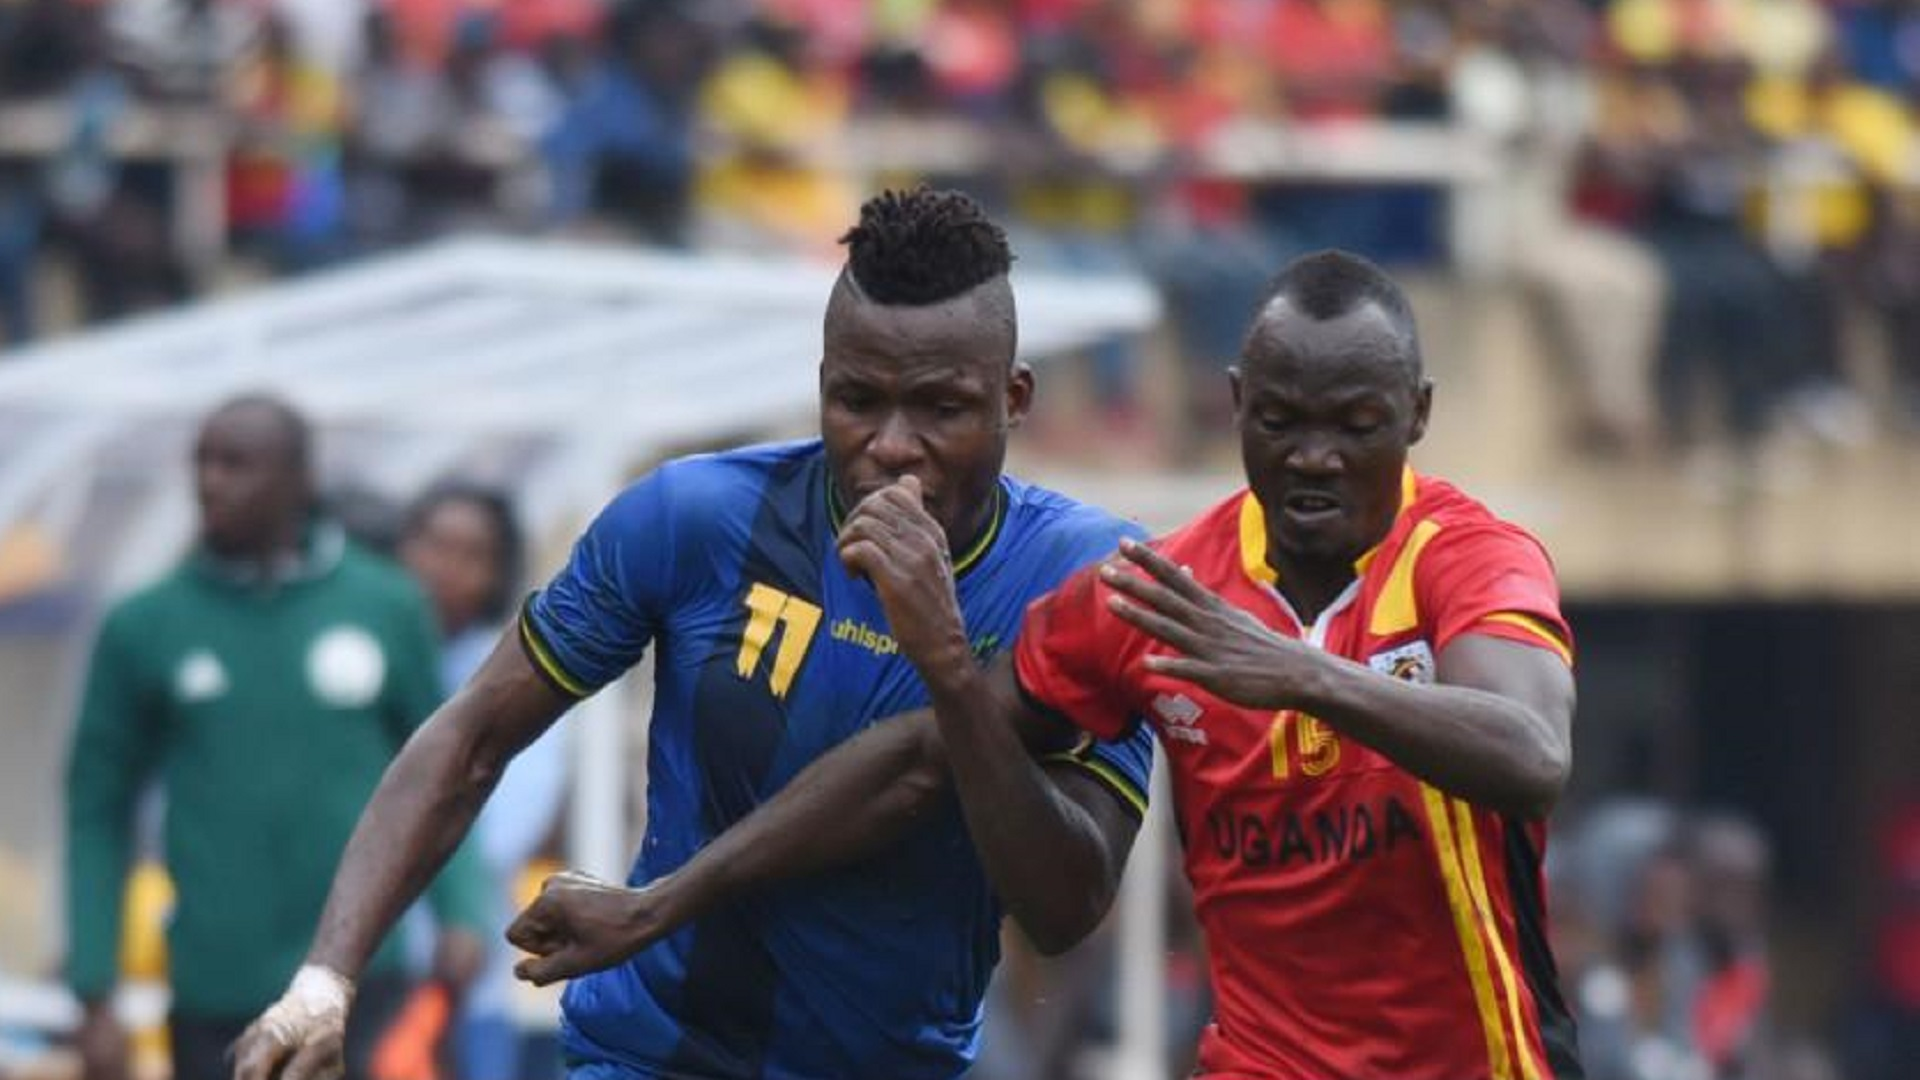 Uganda v Tanzania Match Report, 08/09/2018, Africa Cup of